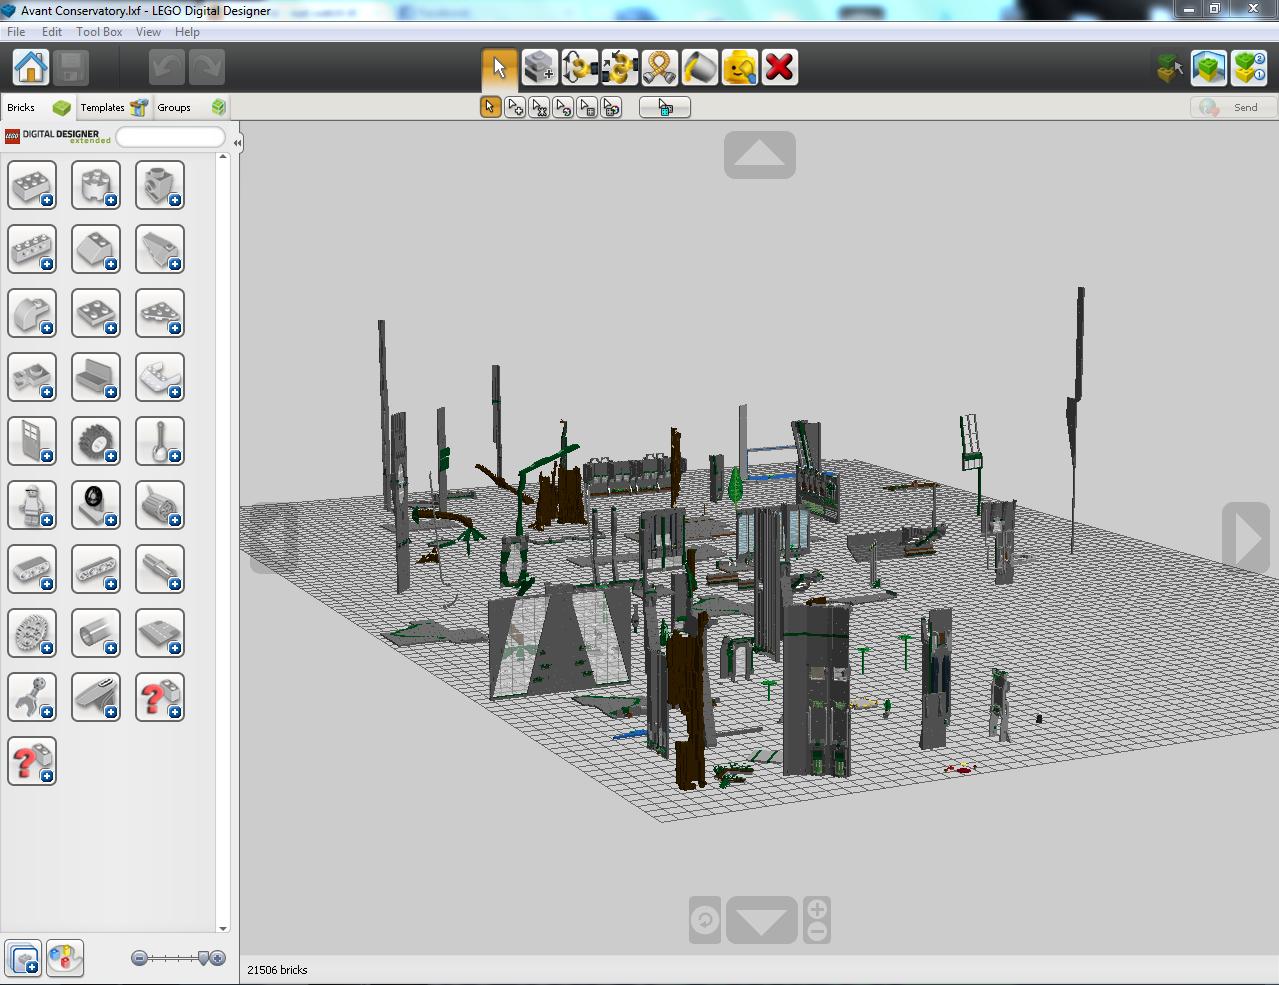 Image Avant Conservatory Construction Lddg Lego Universe Wiki